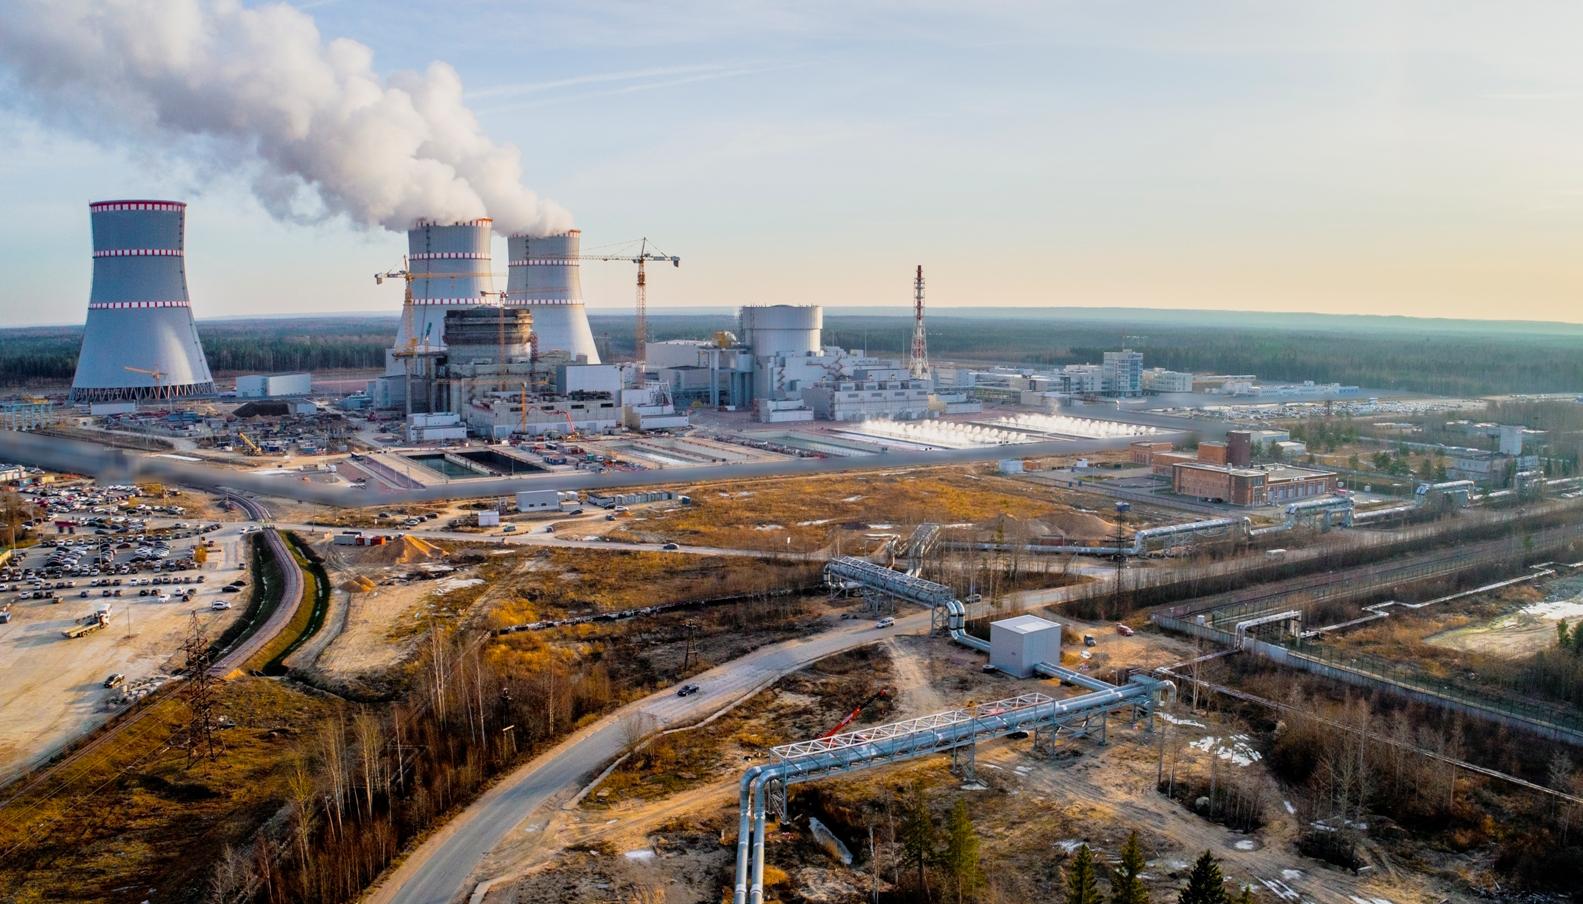 каждый картинка бор атомная электростанция текирова